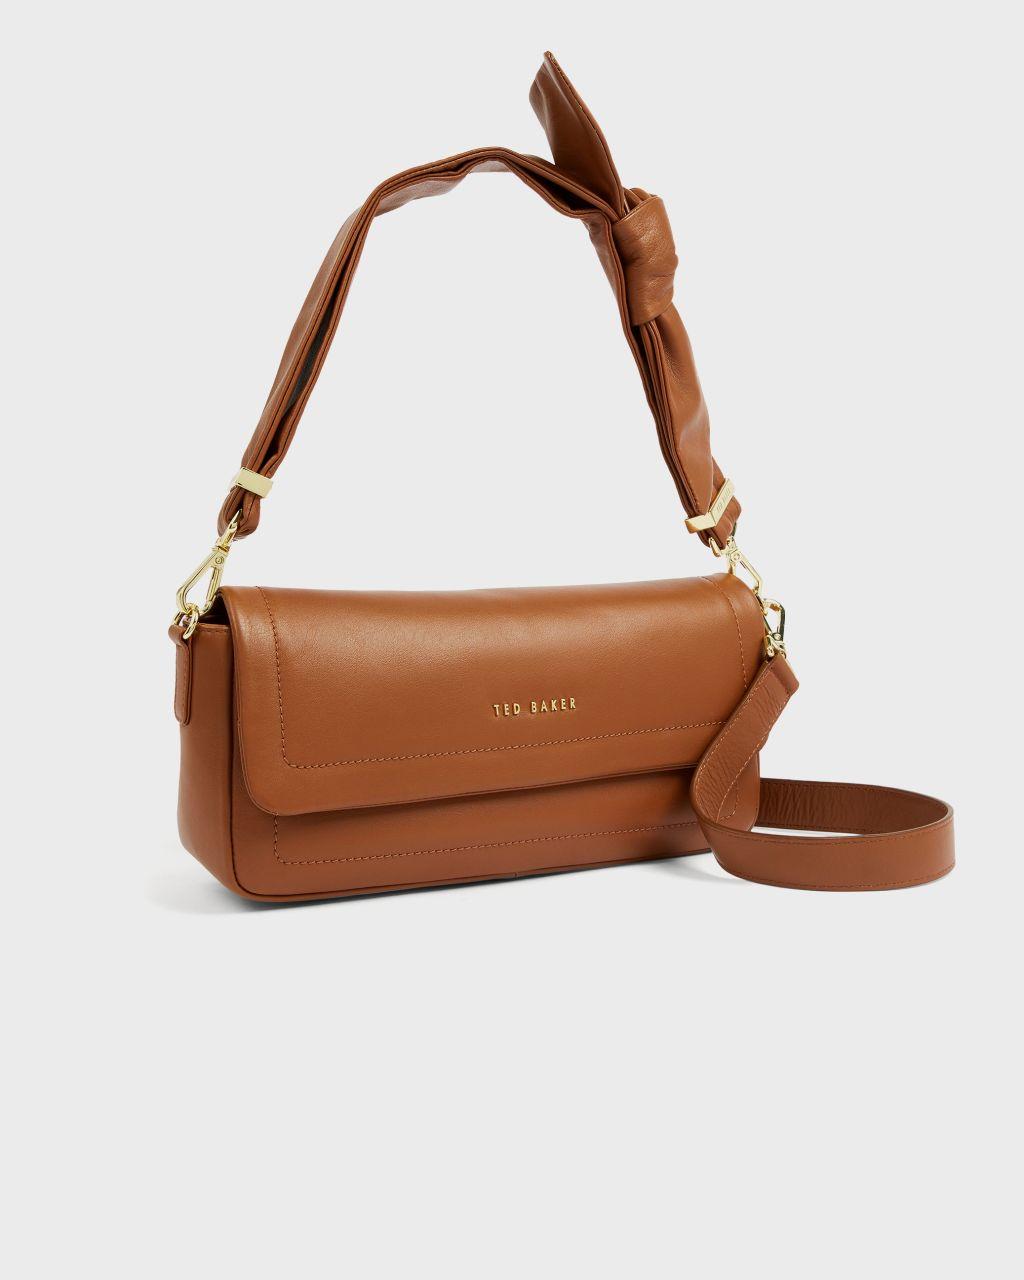 TED BAKER Baguette Tasche Mit Knotendetail | TED BAKER SALE